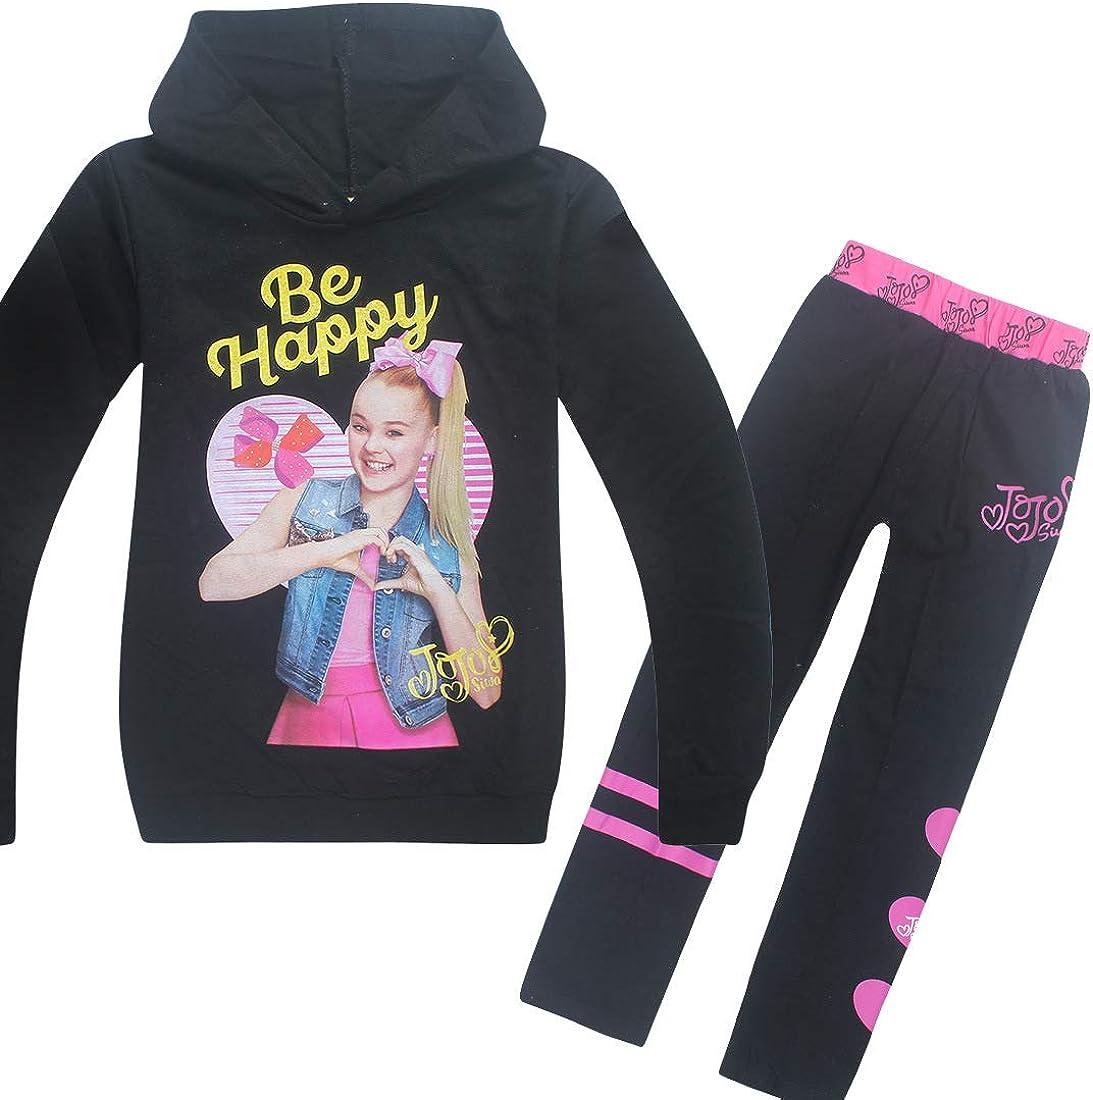 "Wazonton JoJo Siwa Hoodies Casual Shirt Tops and Trouser Printed with /""Be Happy/"""